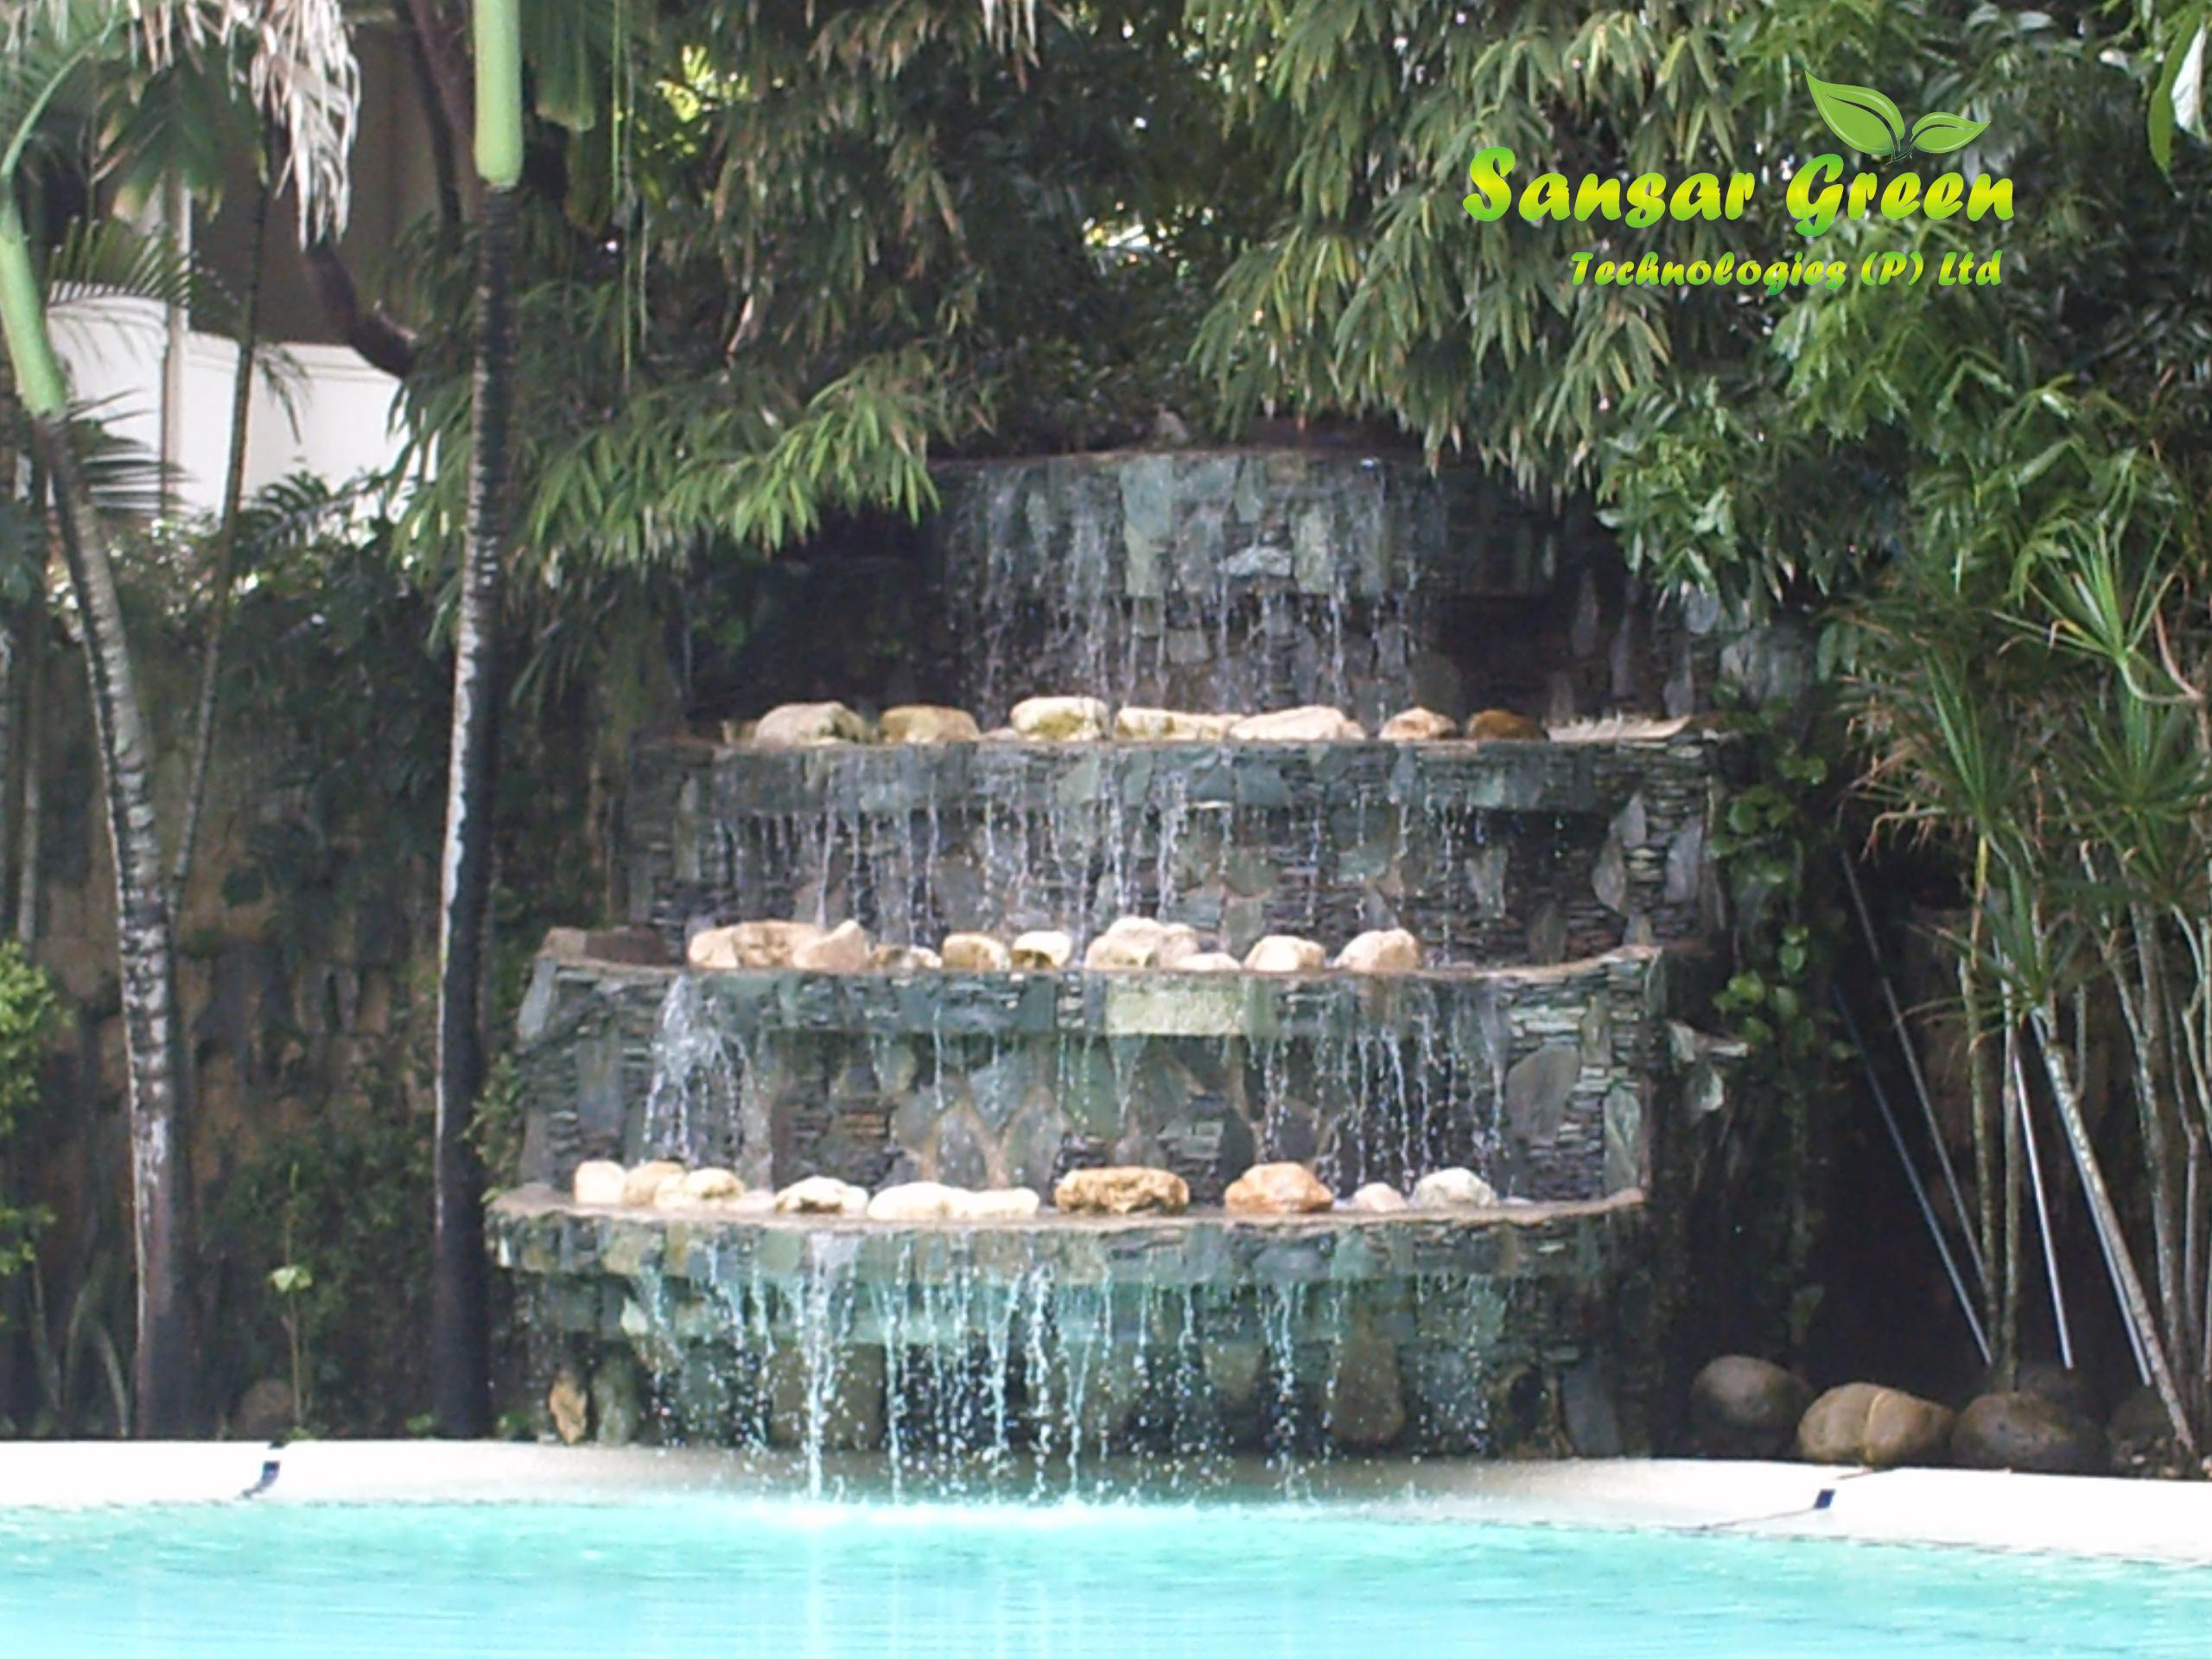 Sansar Fountain Waterfall